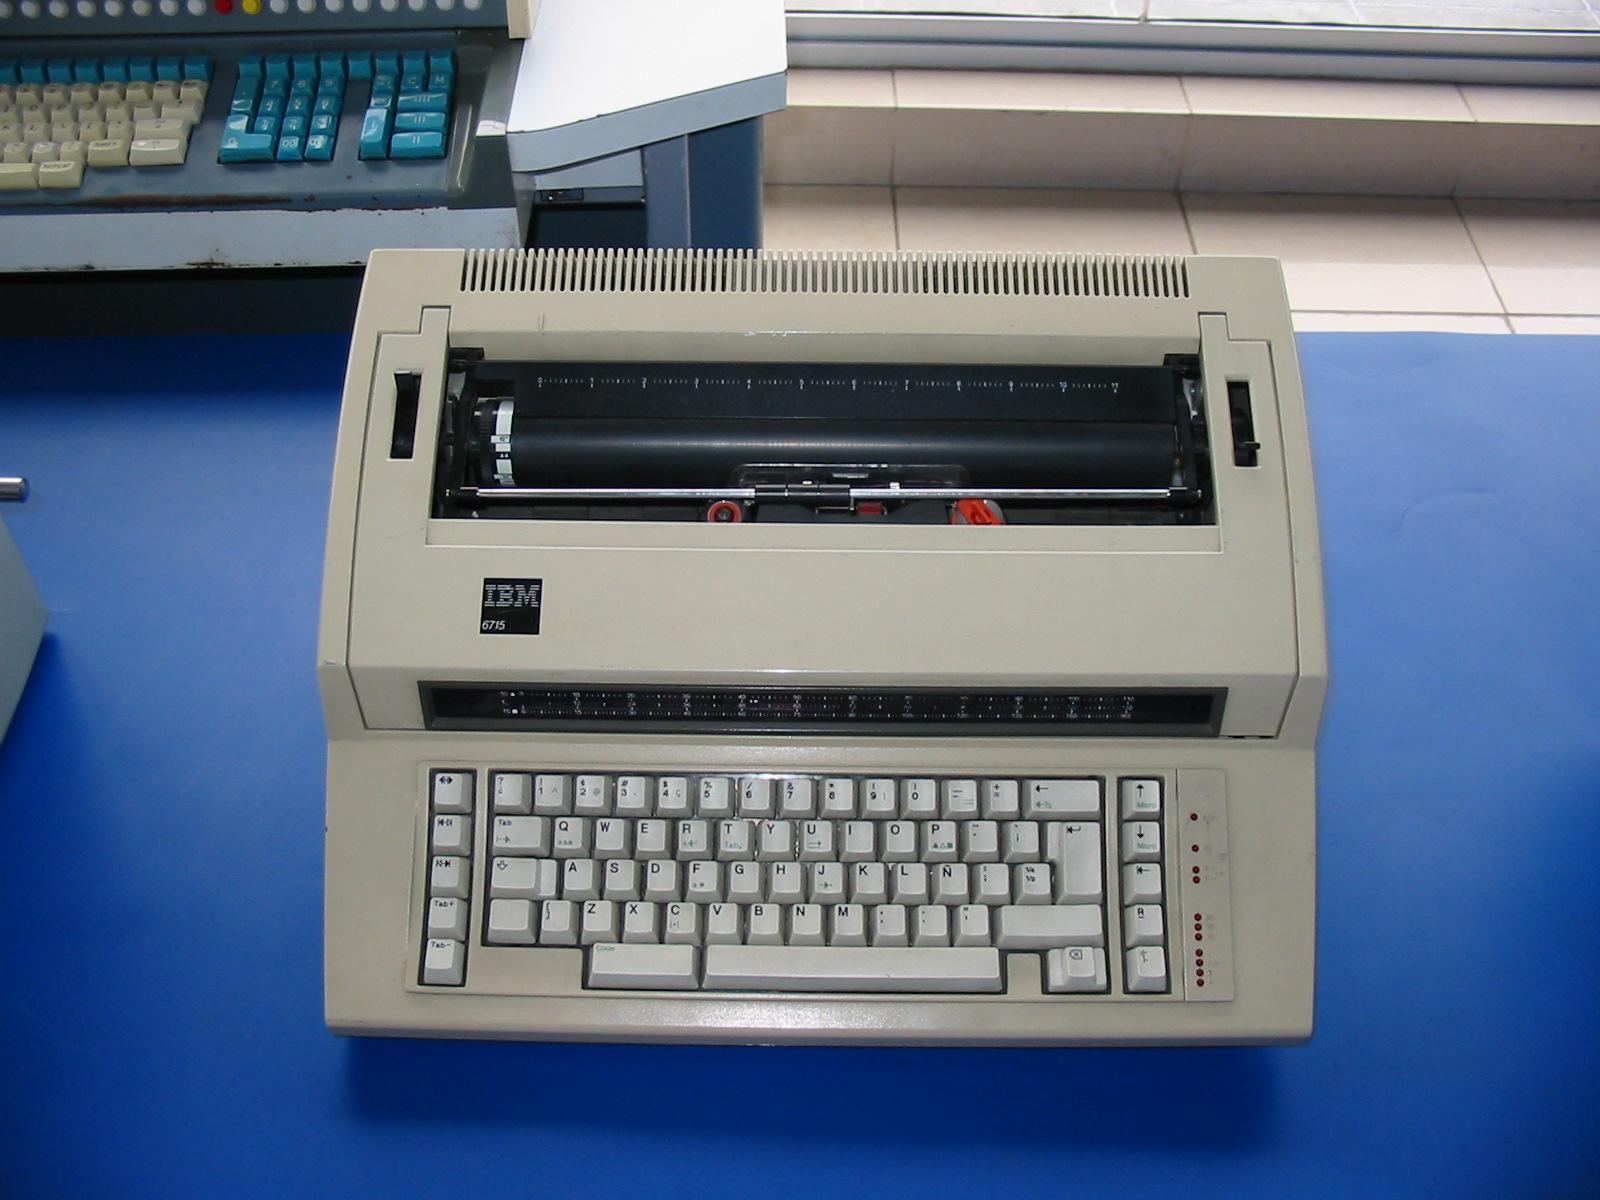 File:IBM TypeWriter 6715 JPG - Wikimedia Commons